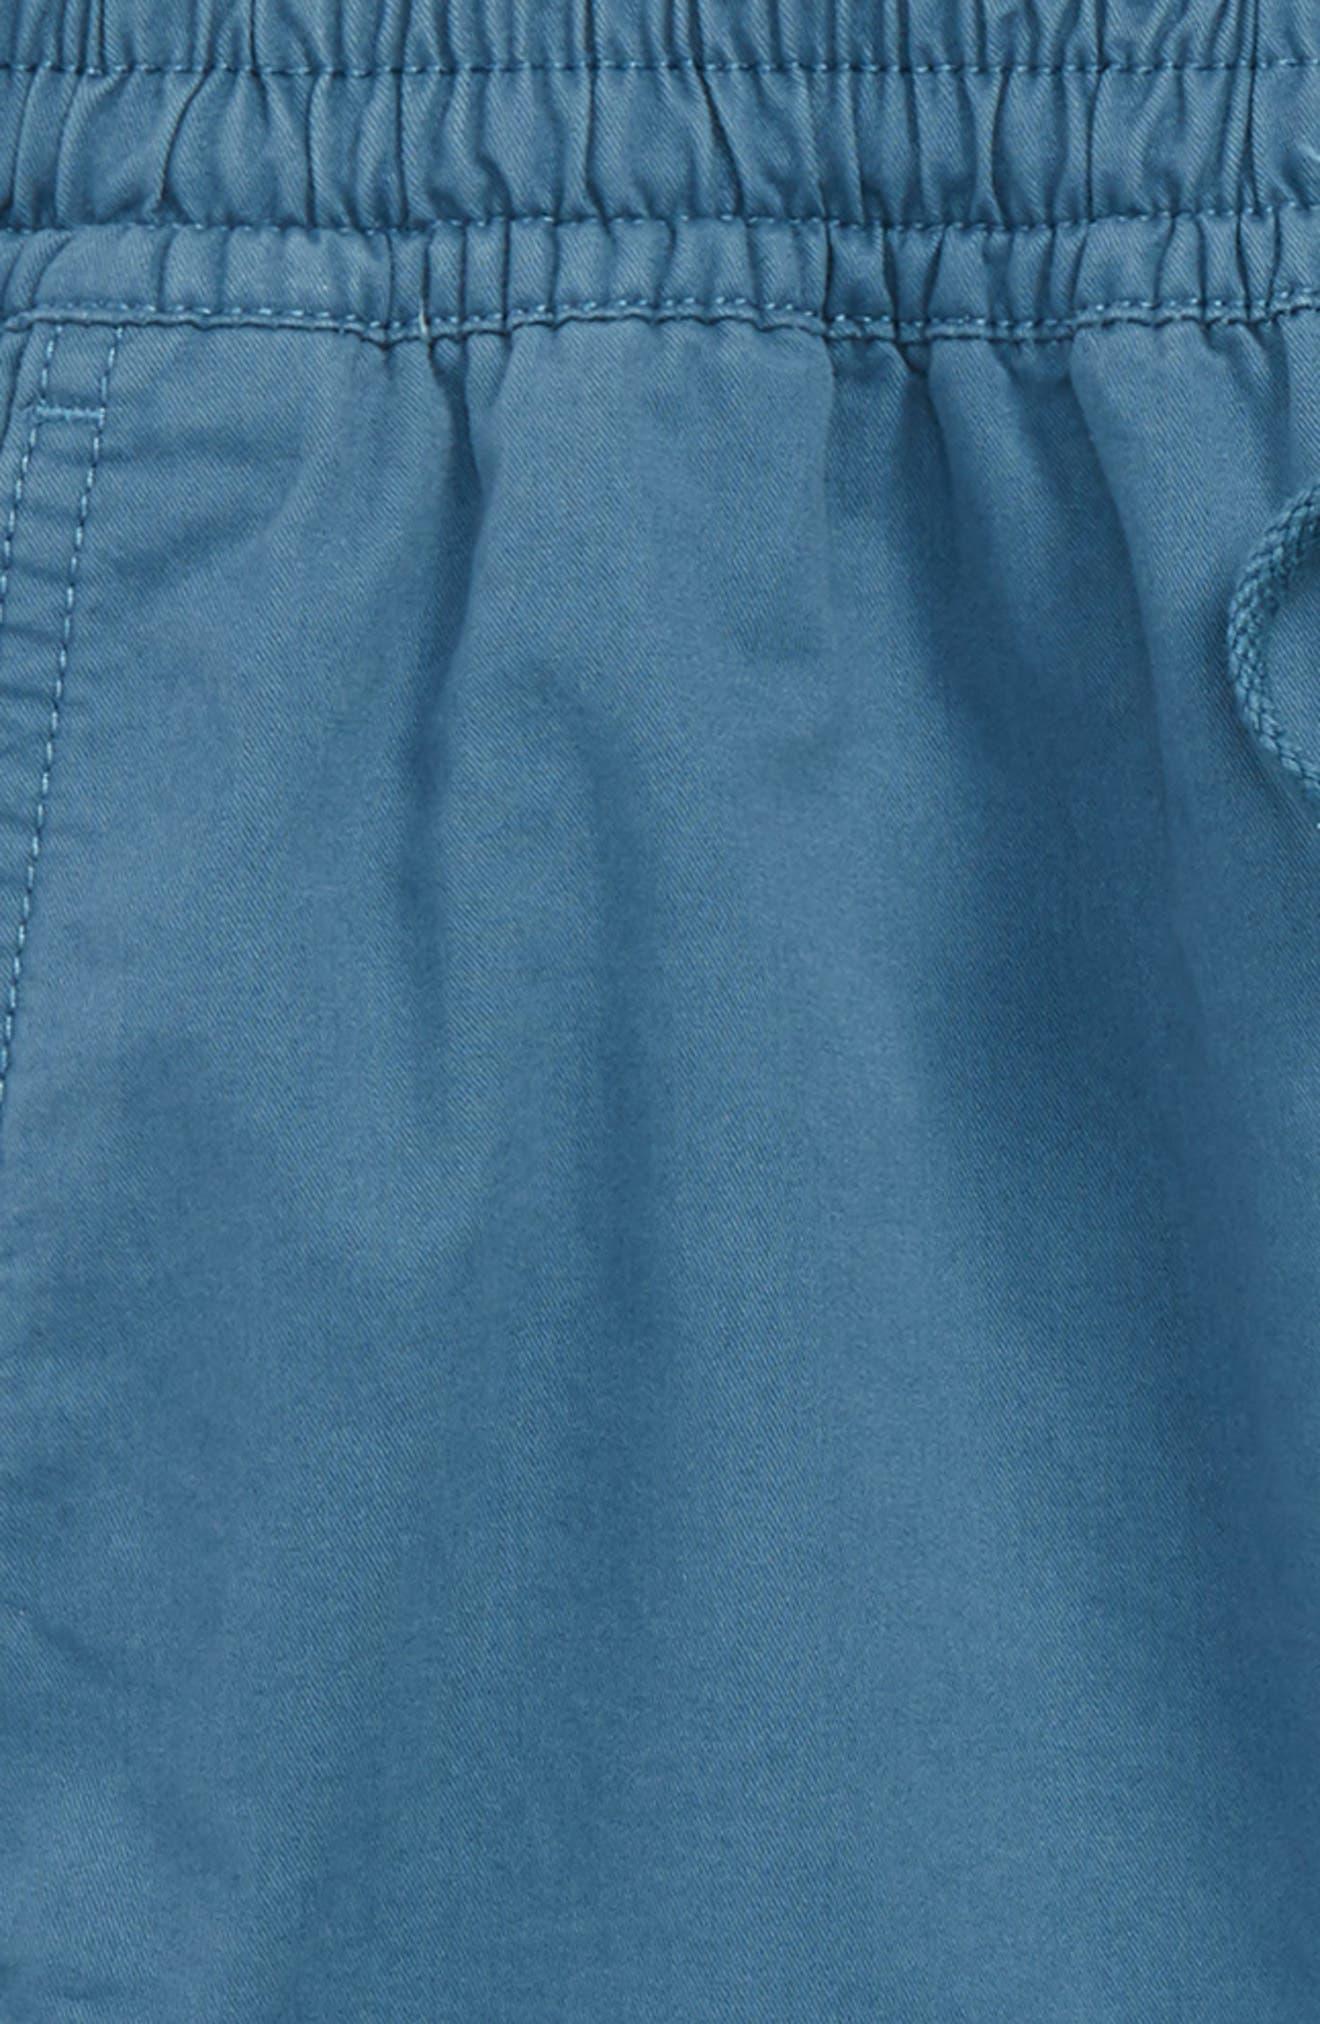 Range Shorts,                             Alternate thumbnail 2, color,                             Real Teal